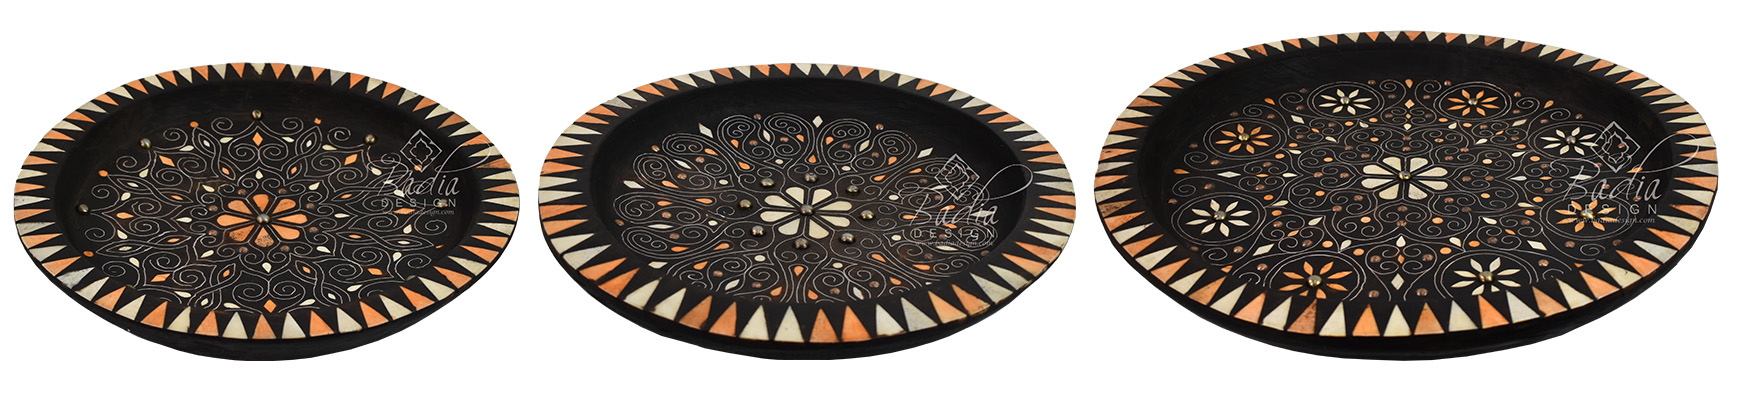 moroccan-decorative-metal-and-bone-bowl-hd234.jpg